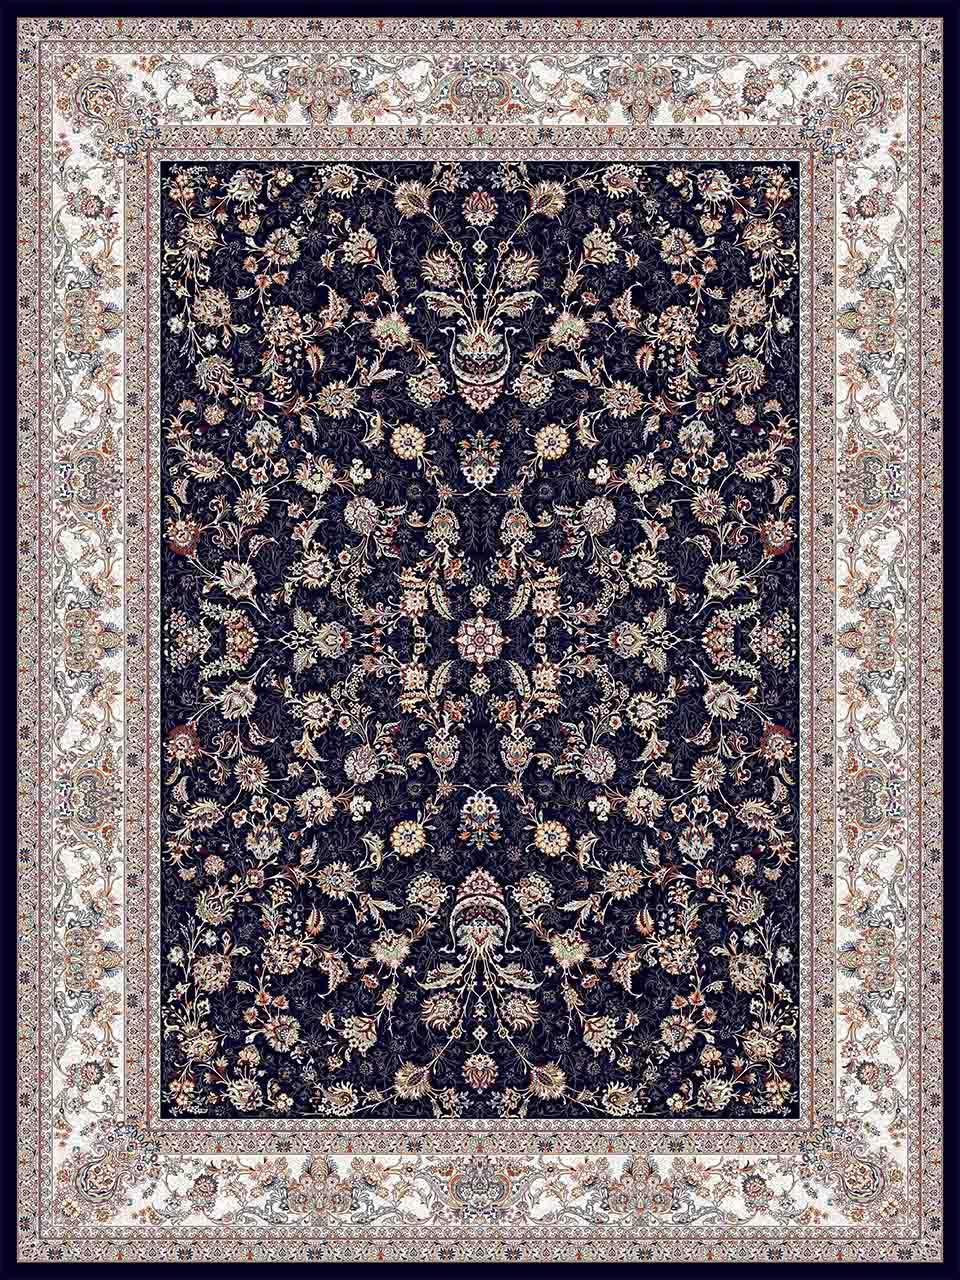 فرش (25041) اکریلیک - 8 رنگ - 700 شانه - سورمه اي - تراکم 2550